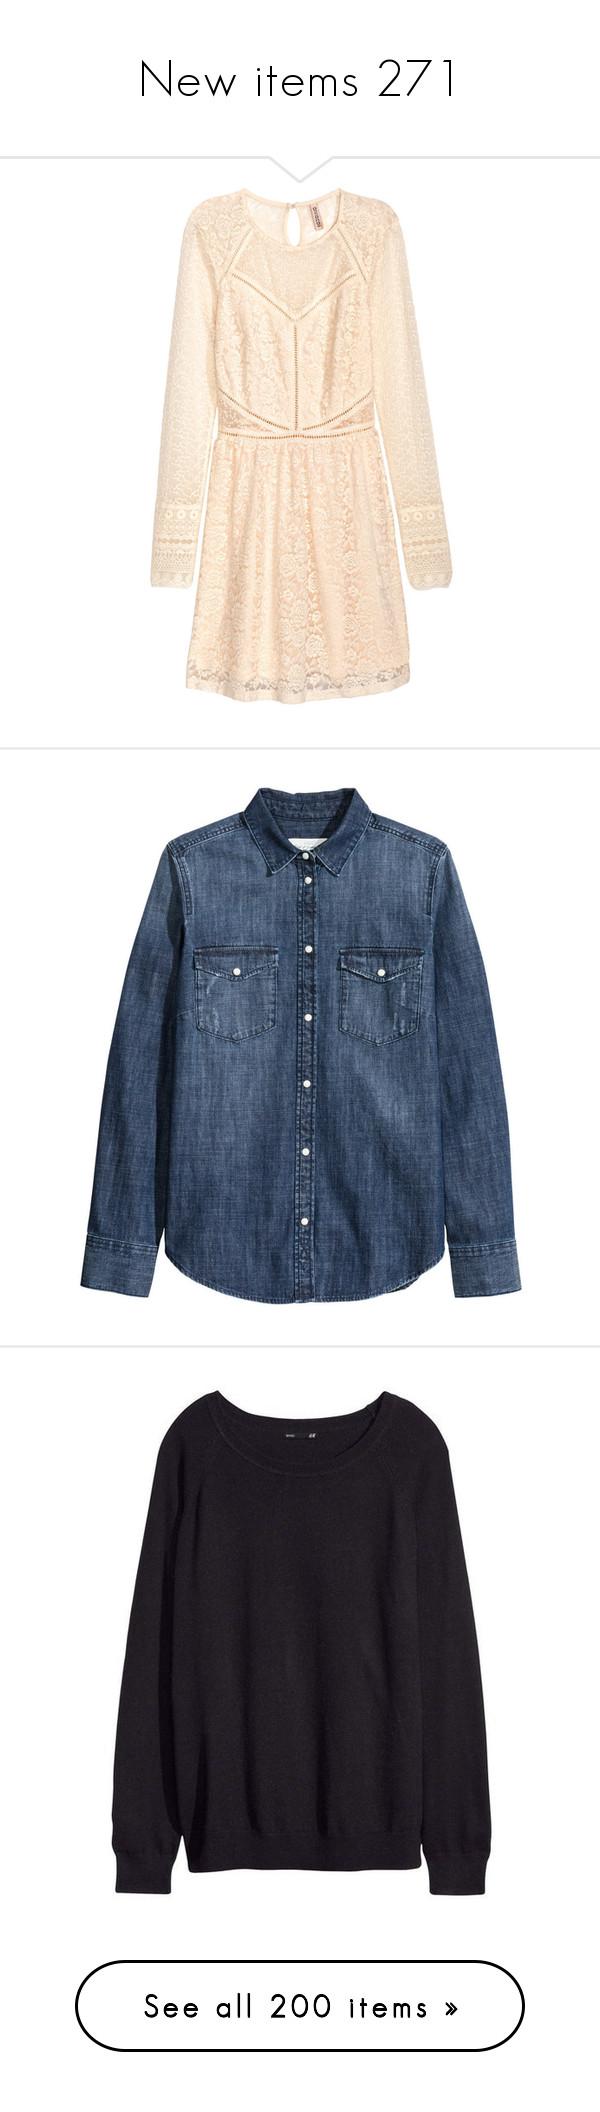 H&m blue lace dress  New items